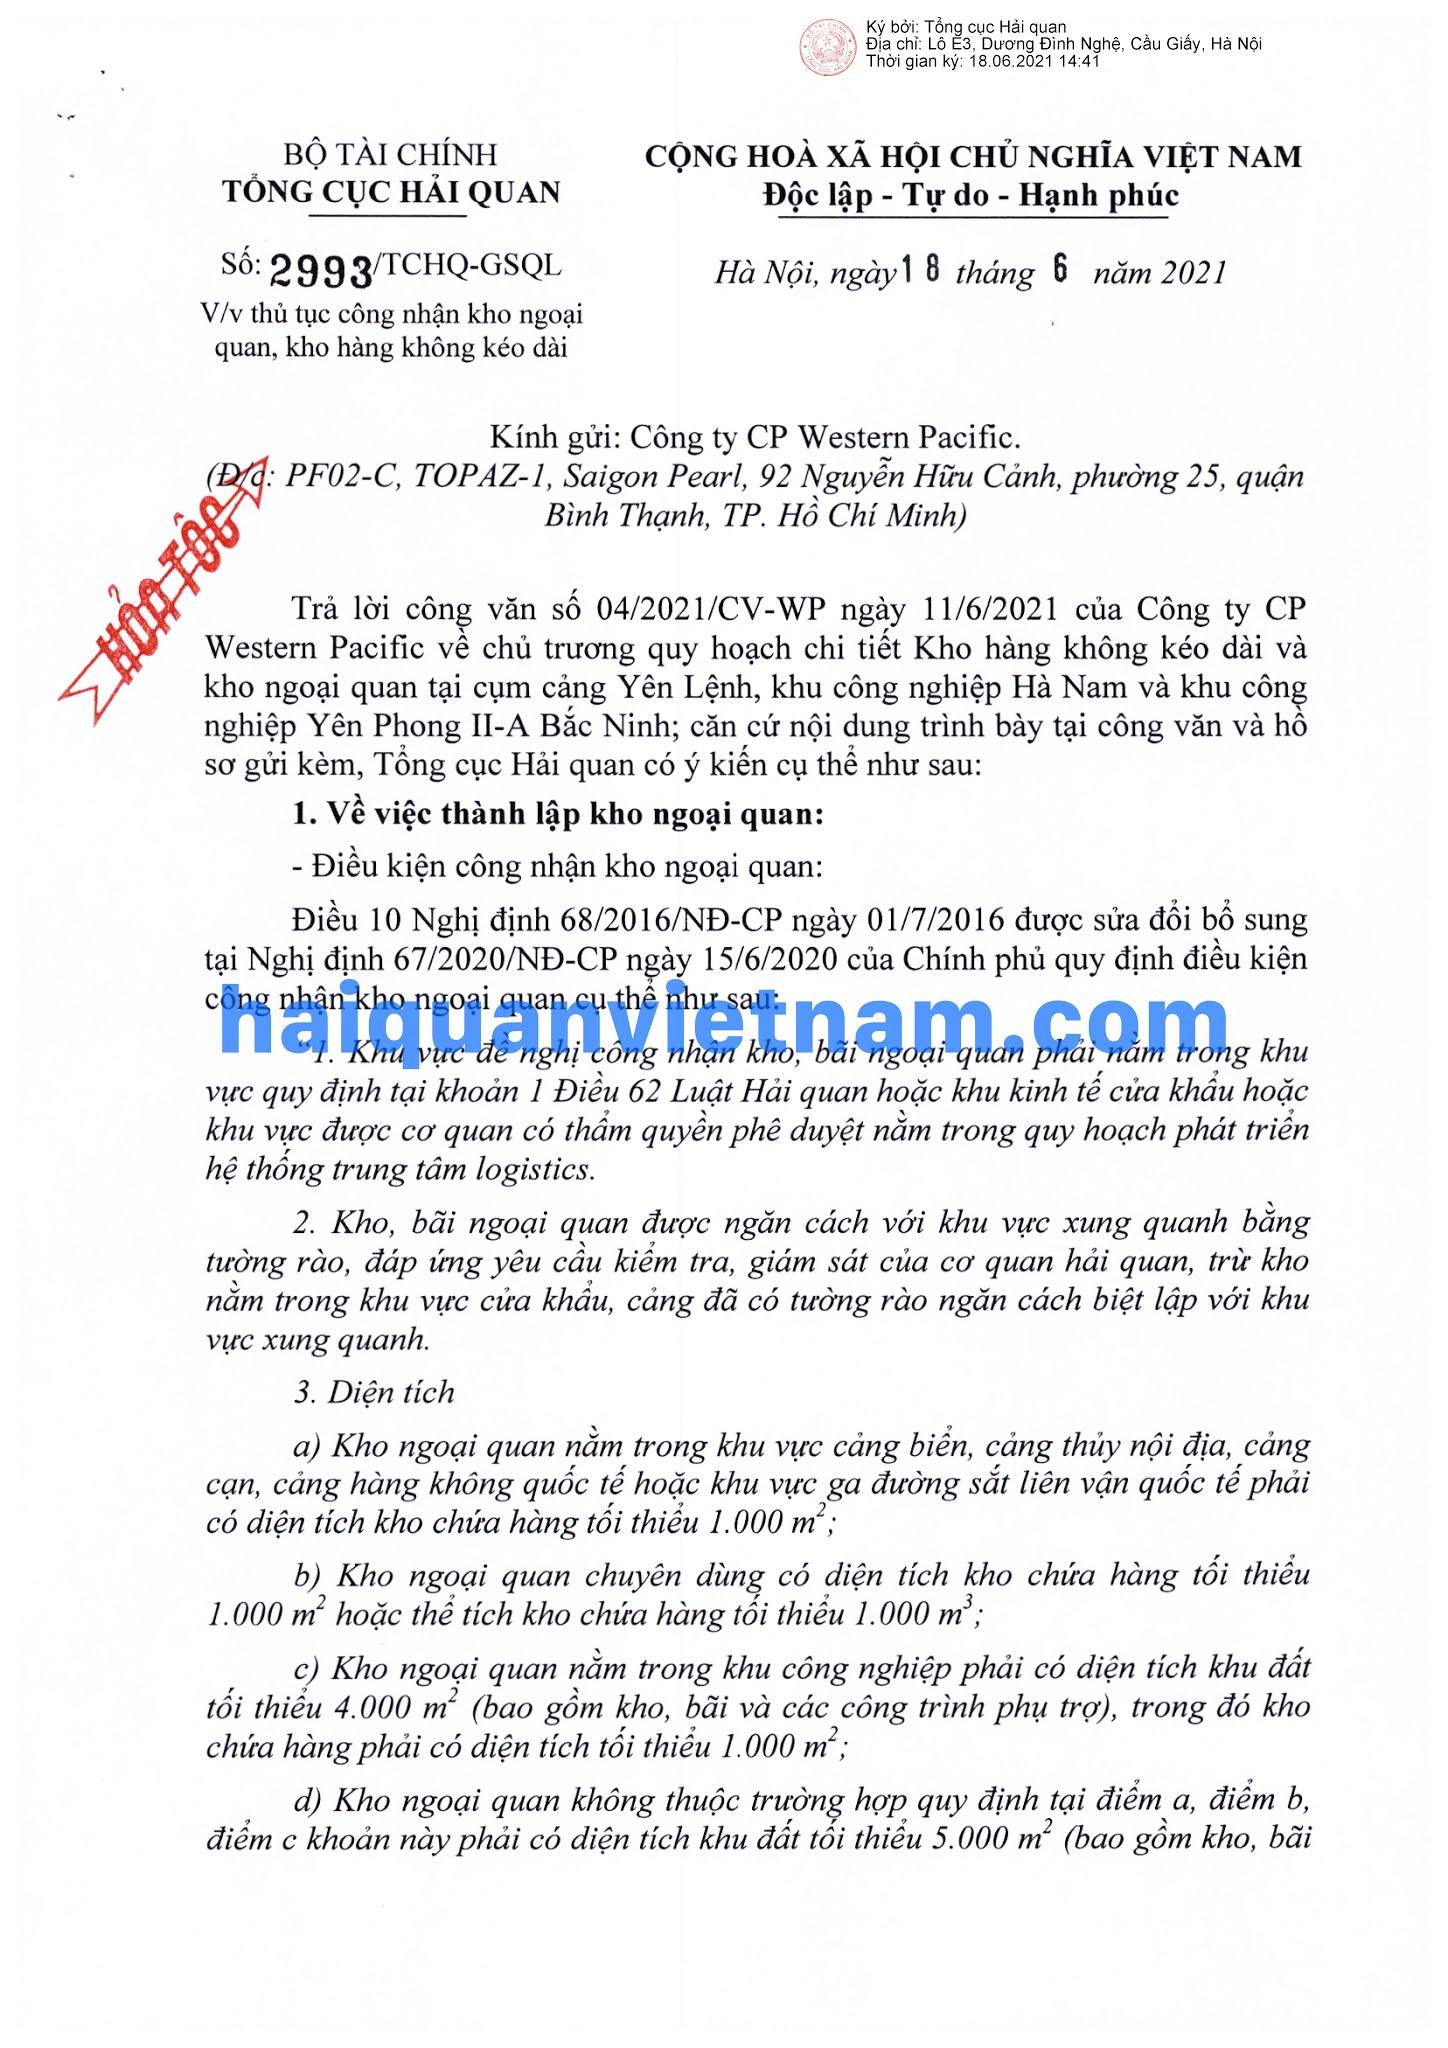 [Image: 210618_2993_TCHQ-GSQL_haiquanvietnam_01.jpg]